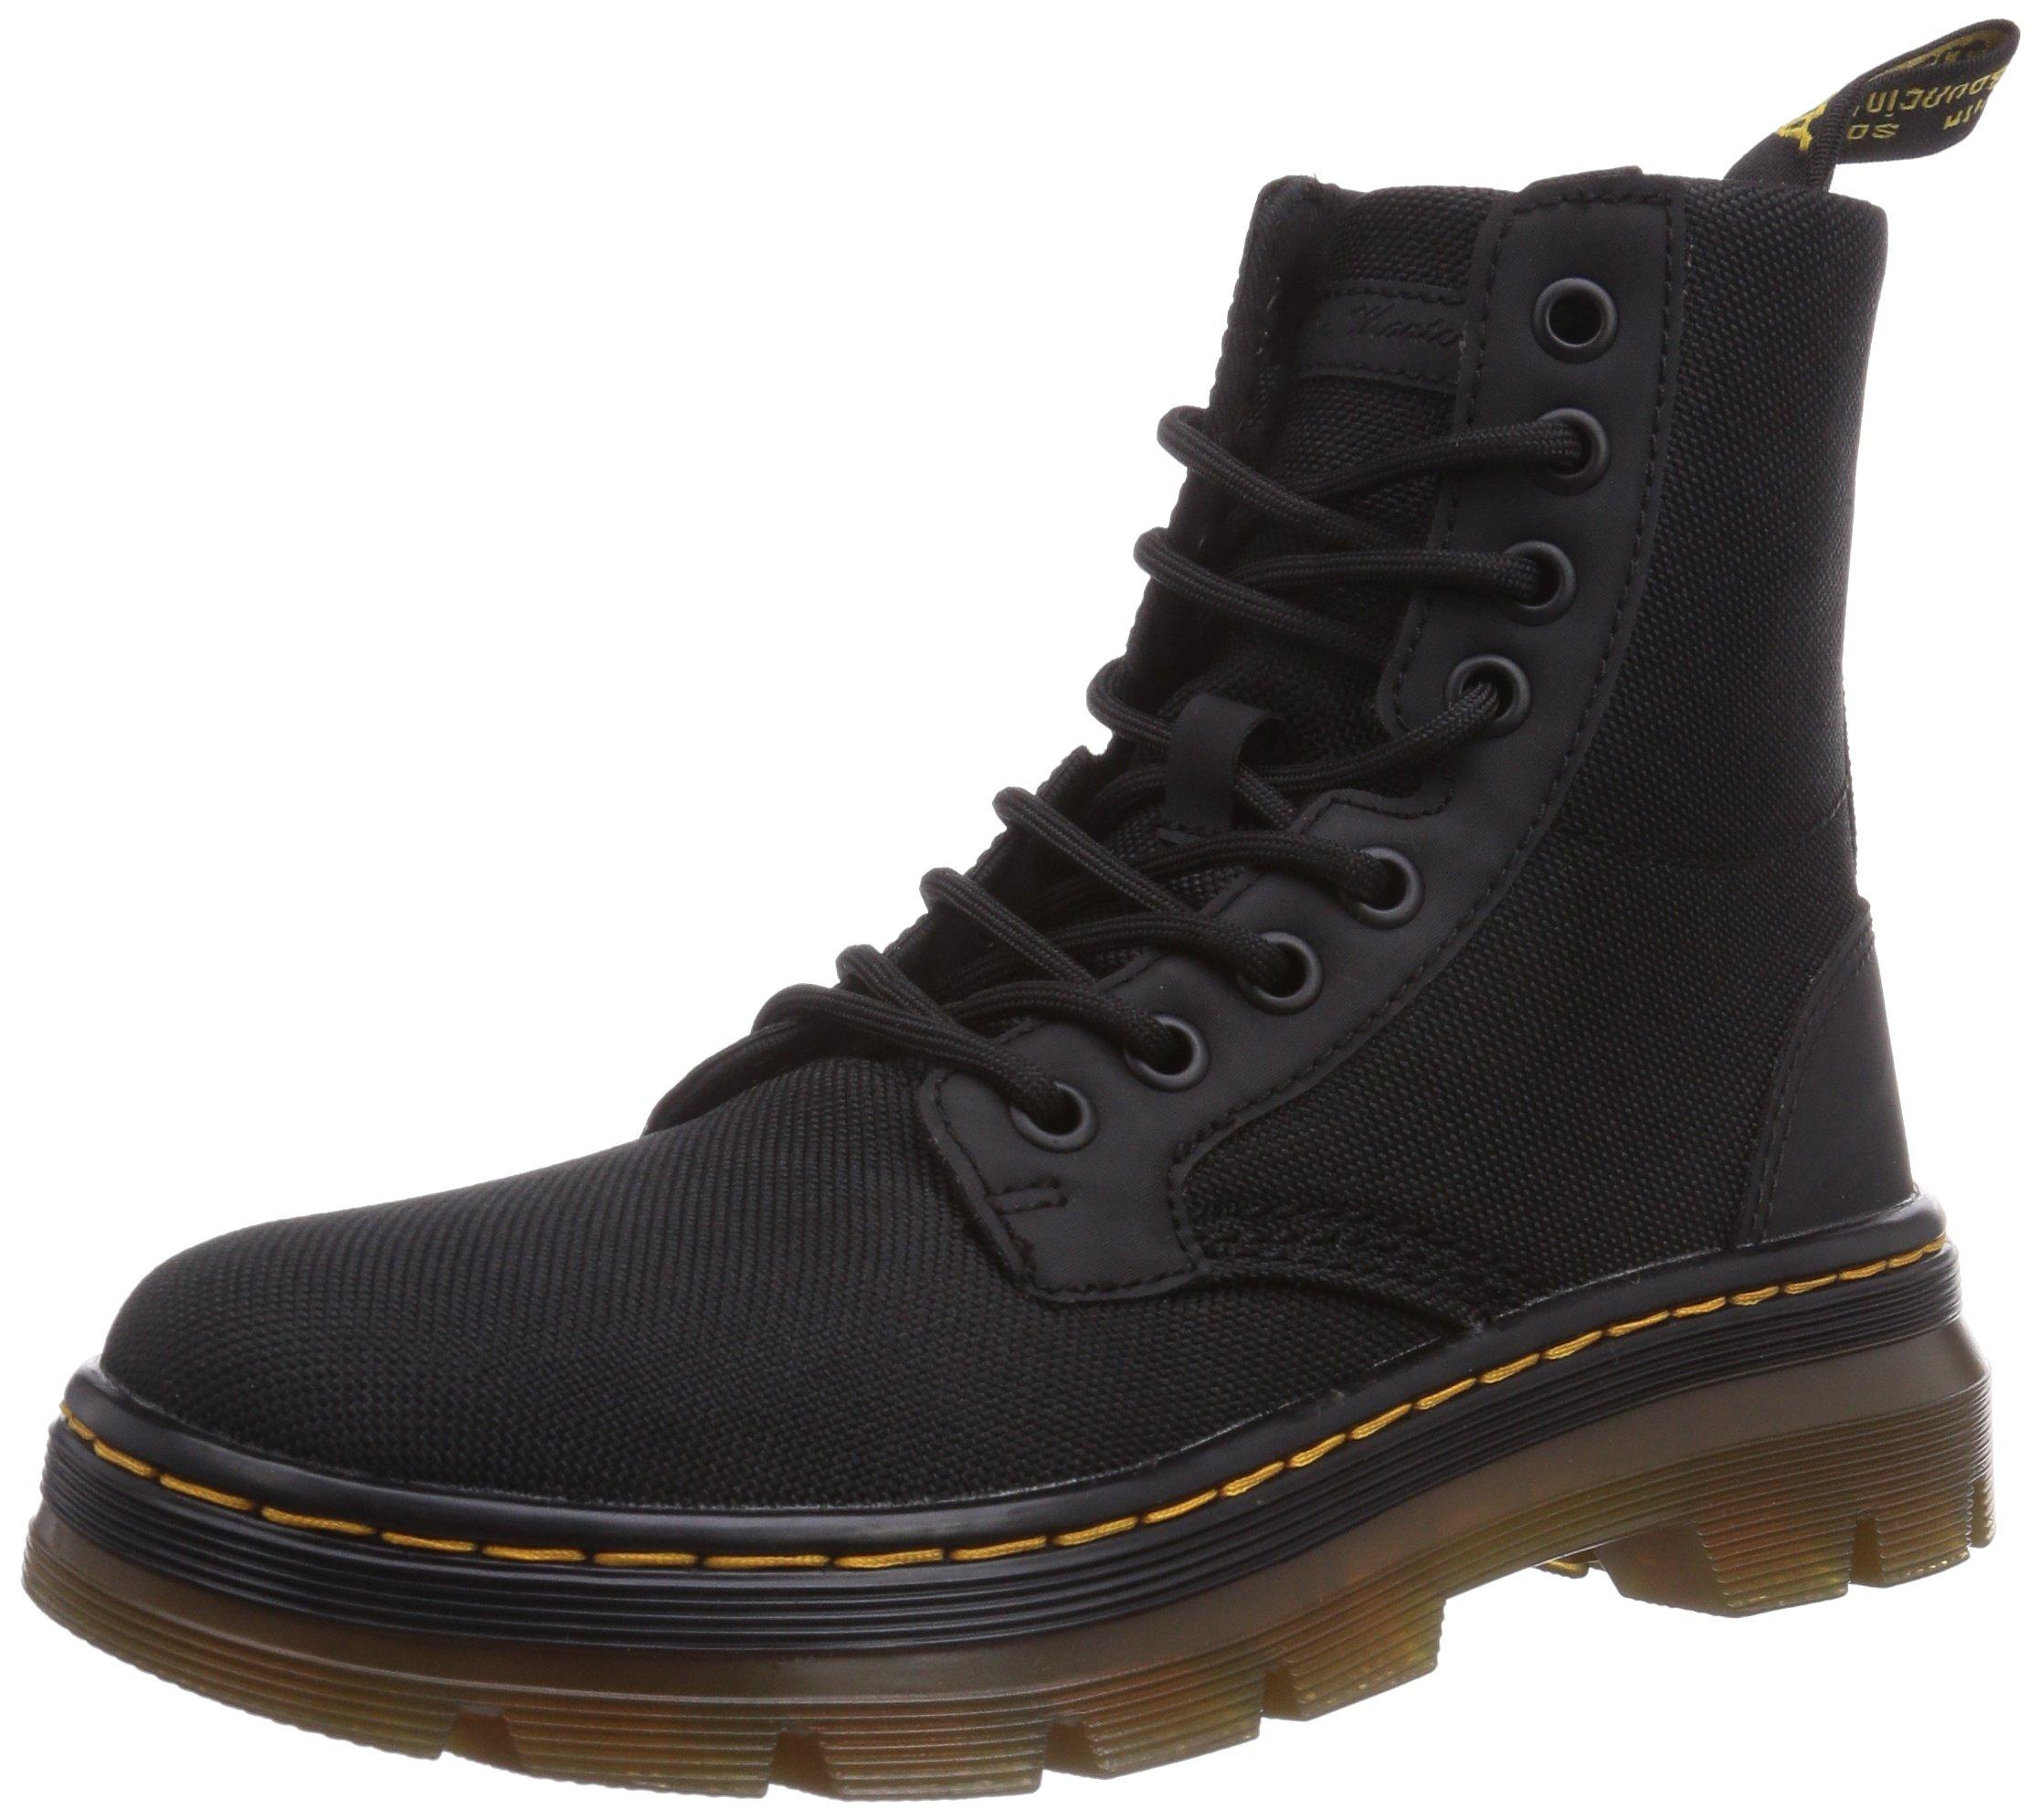 Dr. Martens Men's Combs Nylon Combat Boot, Black, 10 UK/11 M US by Dr. Martens